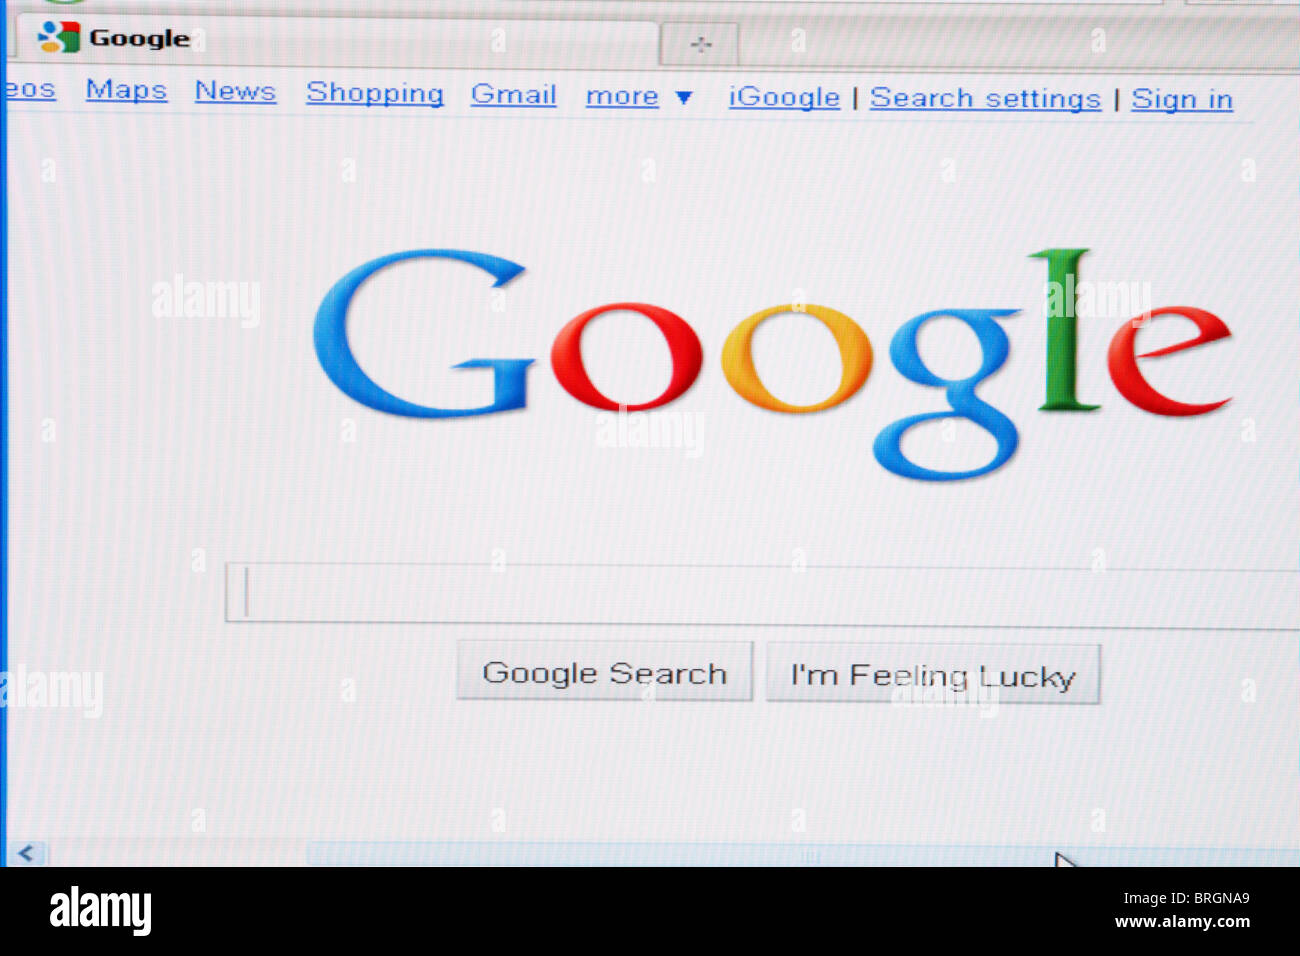 Best Kitchen Gallery: Website Screen Shot Of Google Search Engine Stock Photo 31715441 of Google Search Homepage Website on rachelxblog.com